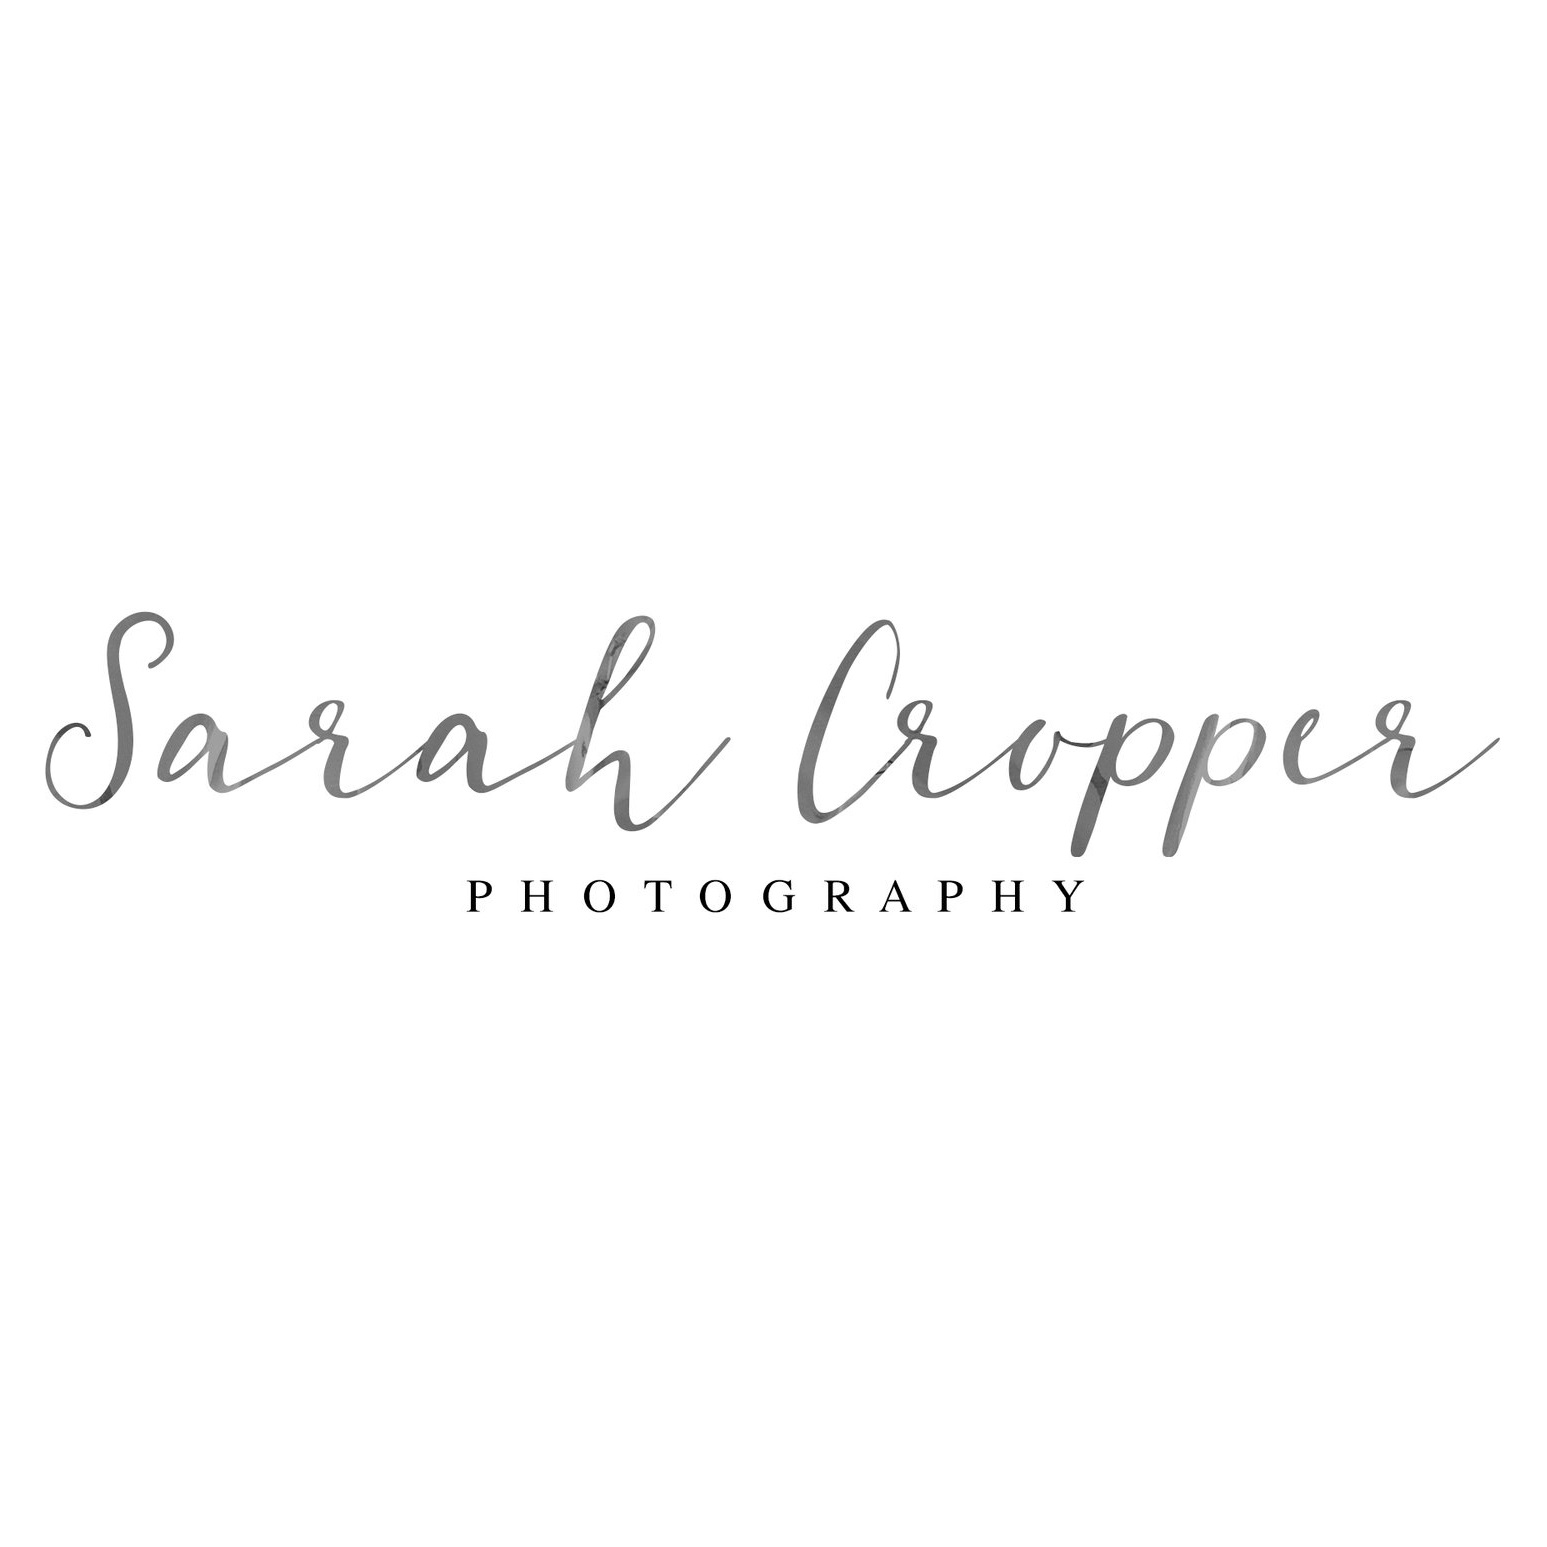 Sarah Cropper Photography